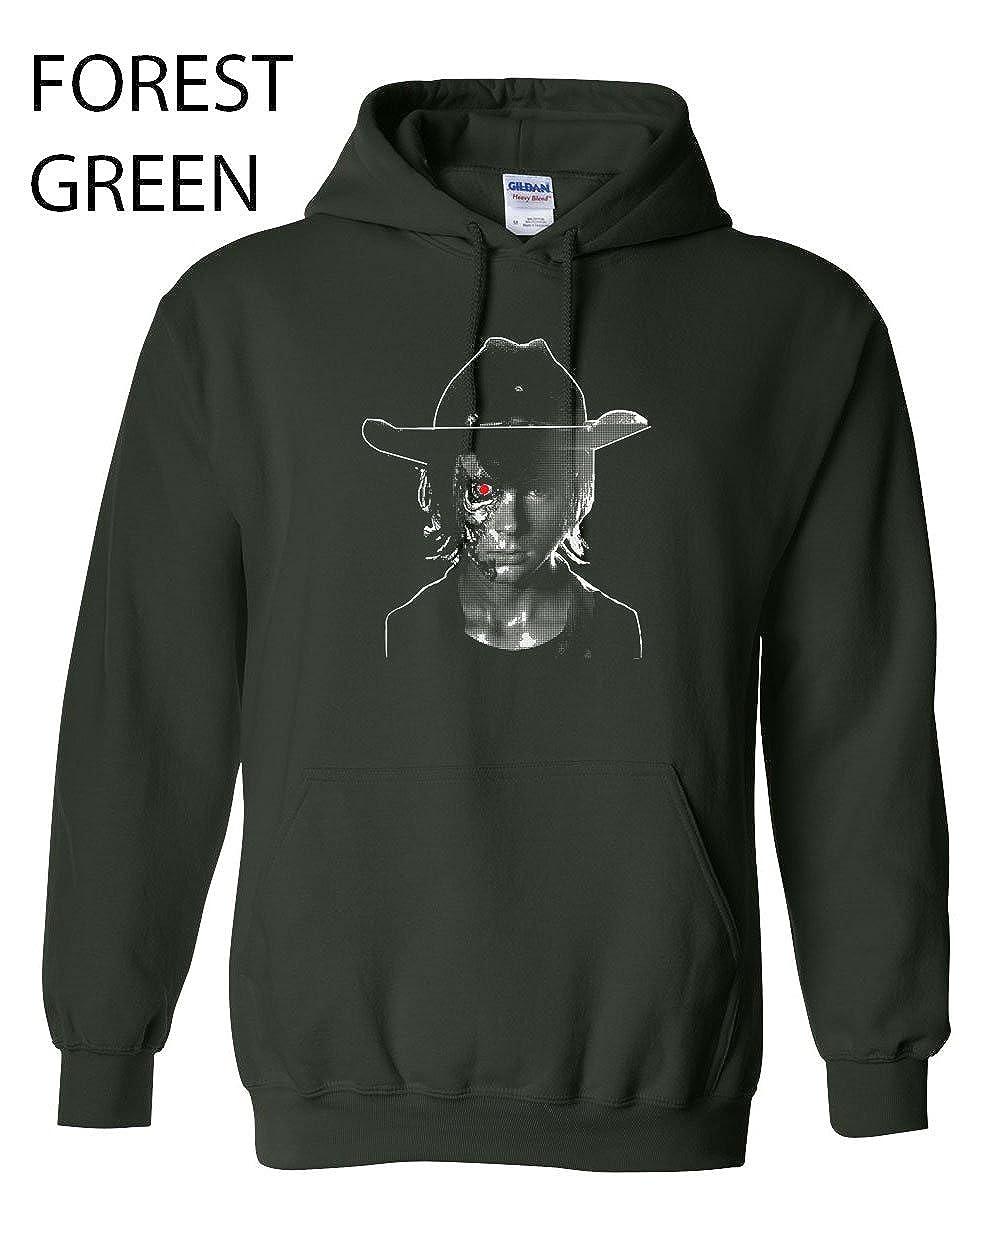 11 Karl Terminator Funny Hooded Sweatshirt